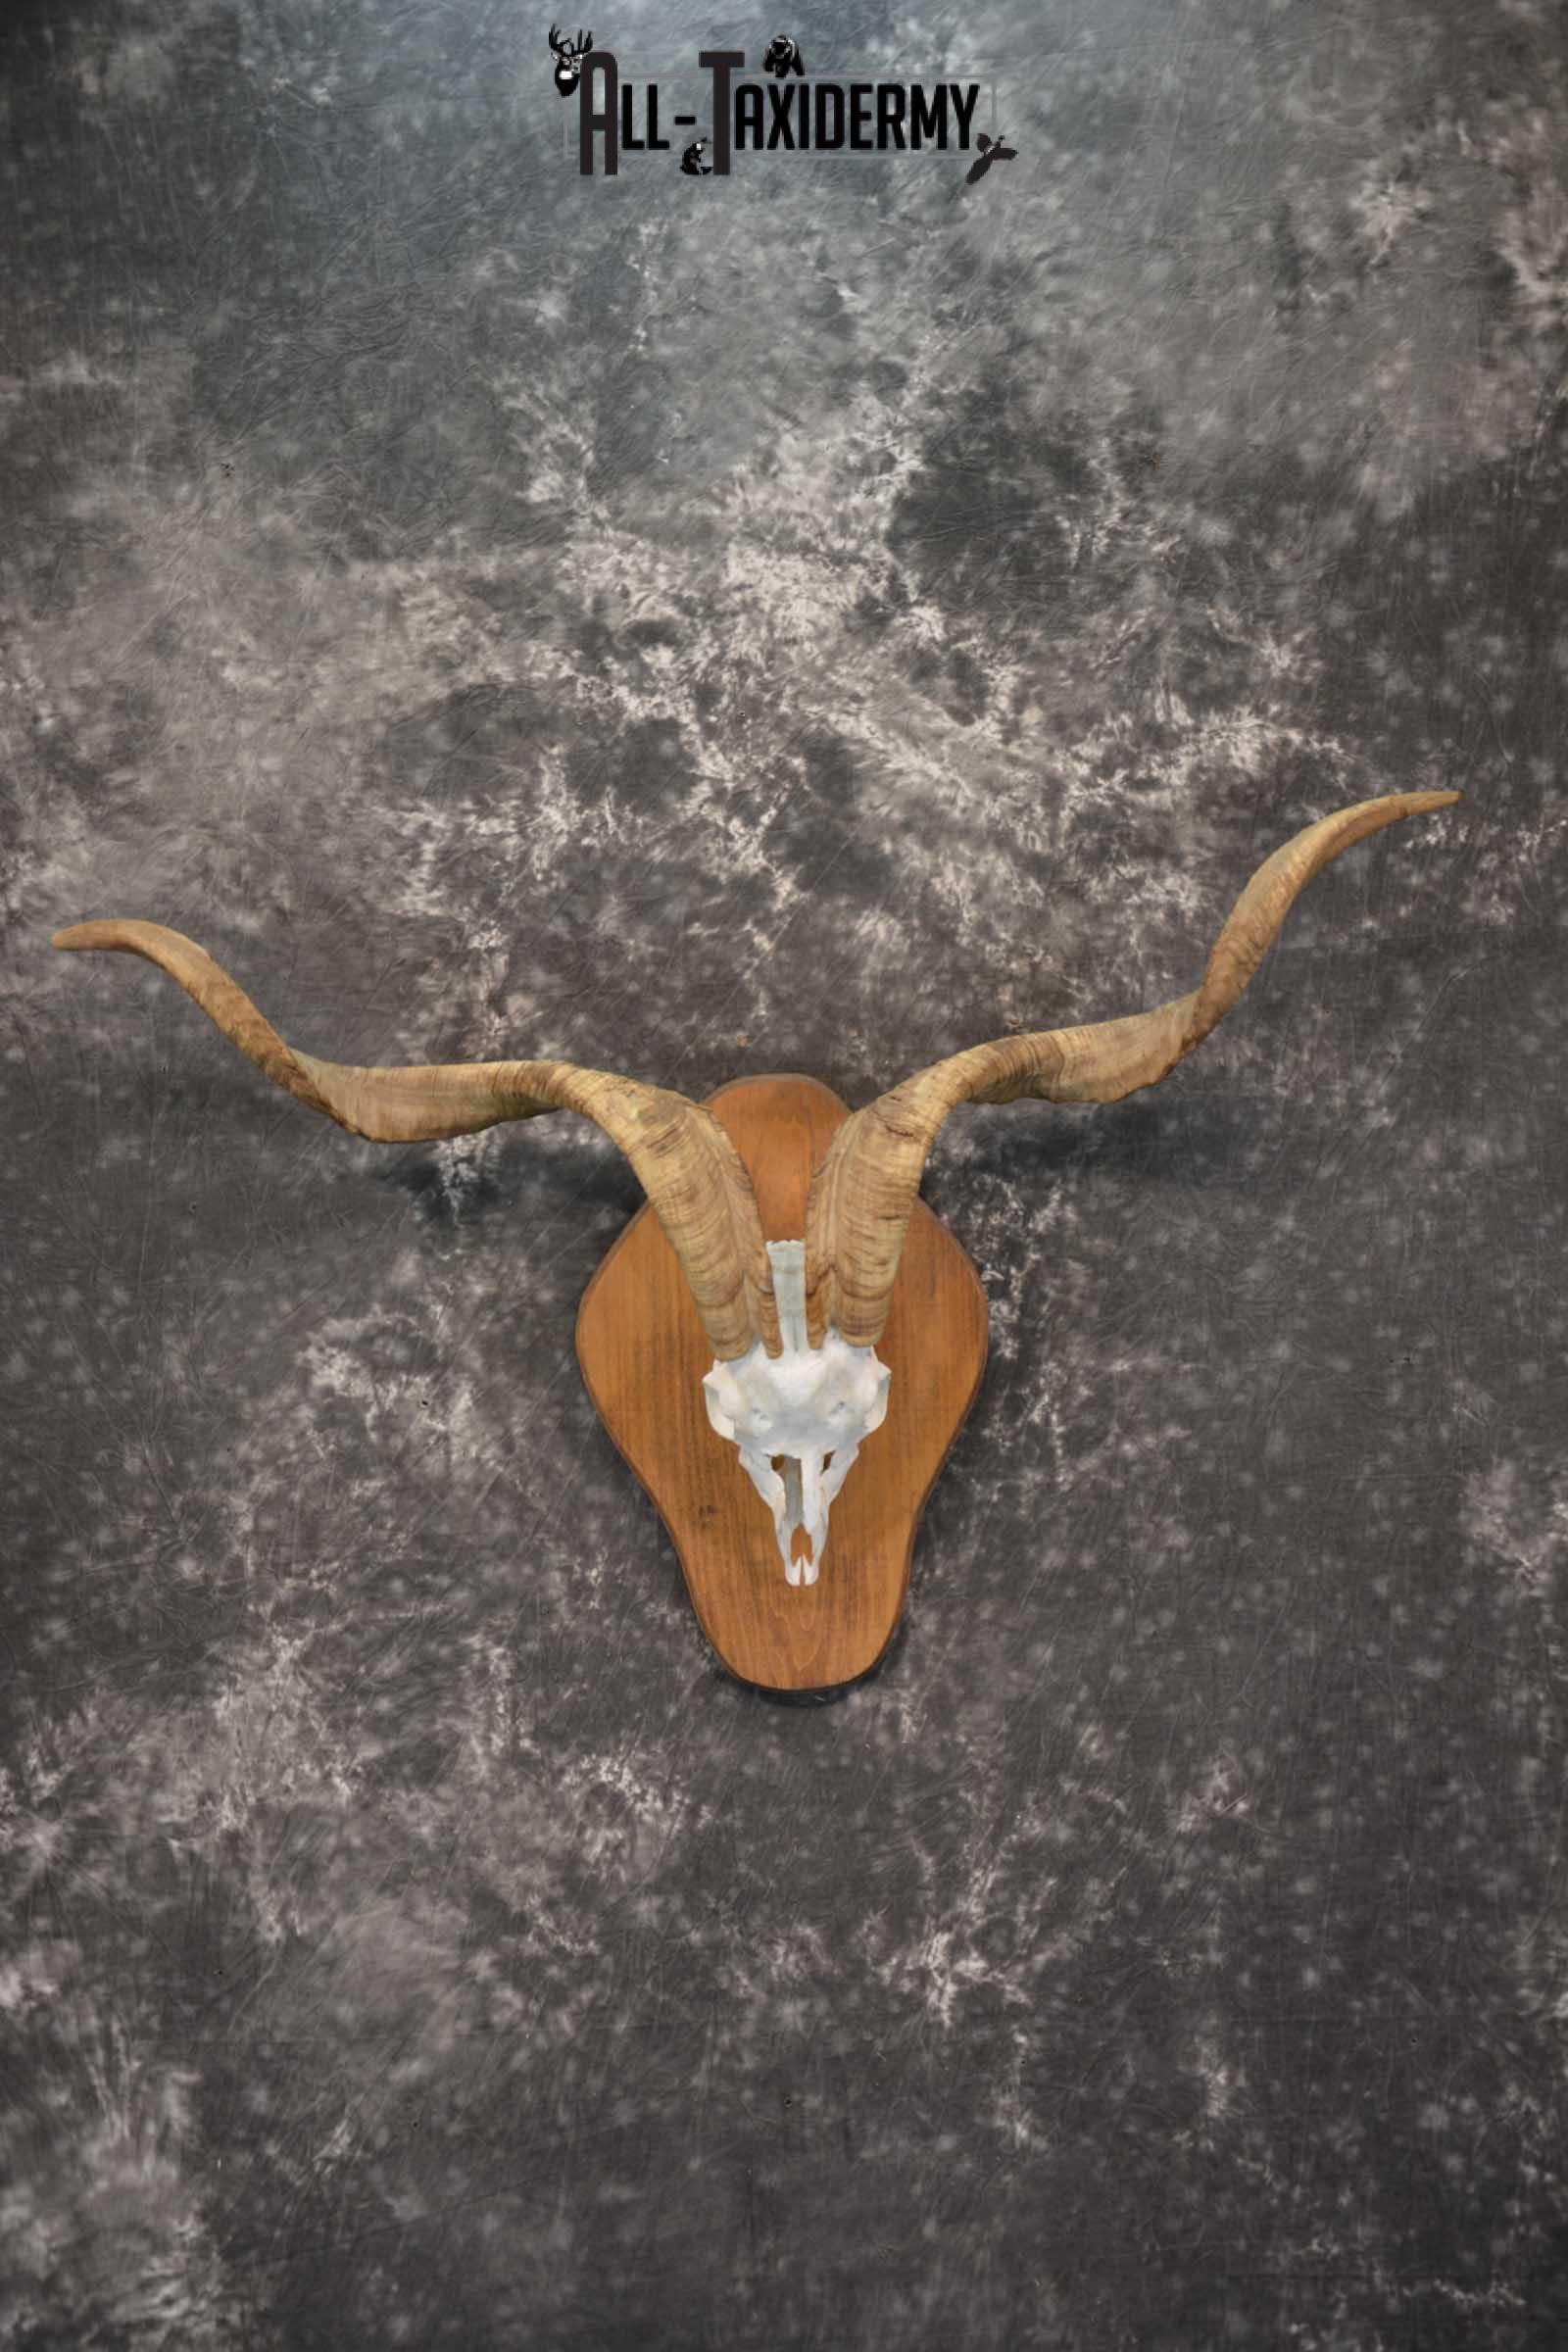 Spanish Goat european skull taxidermy for sale SKU 1783